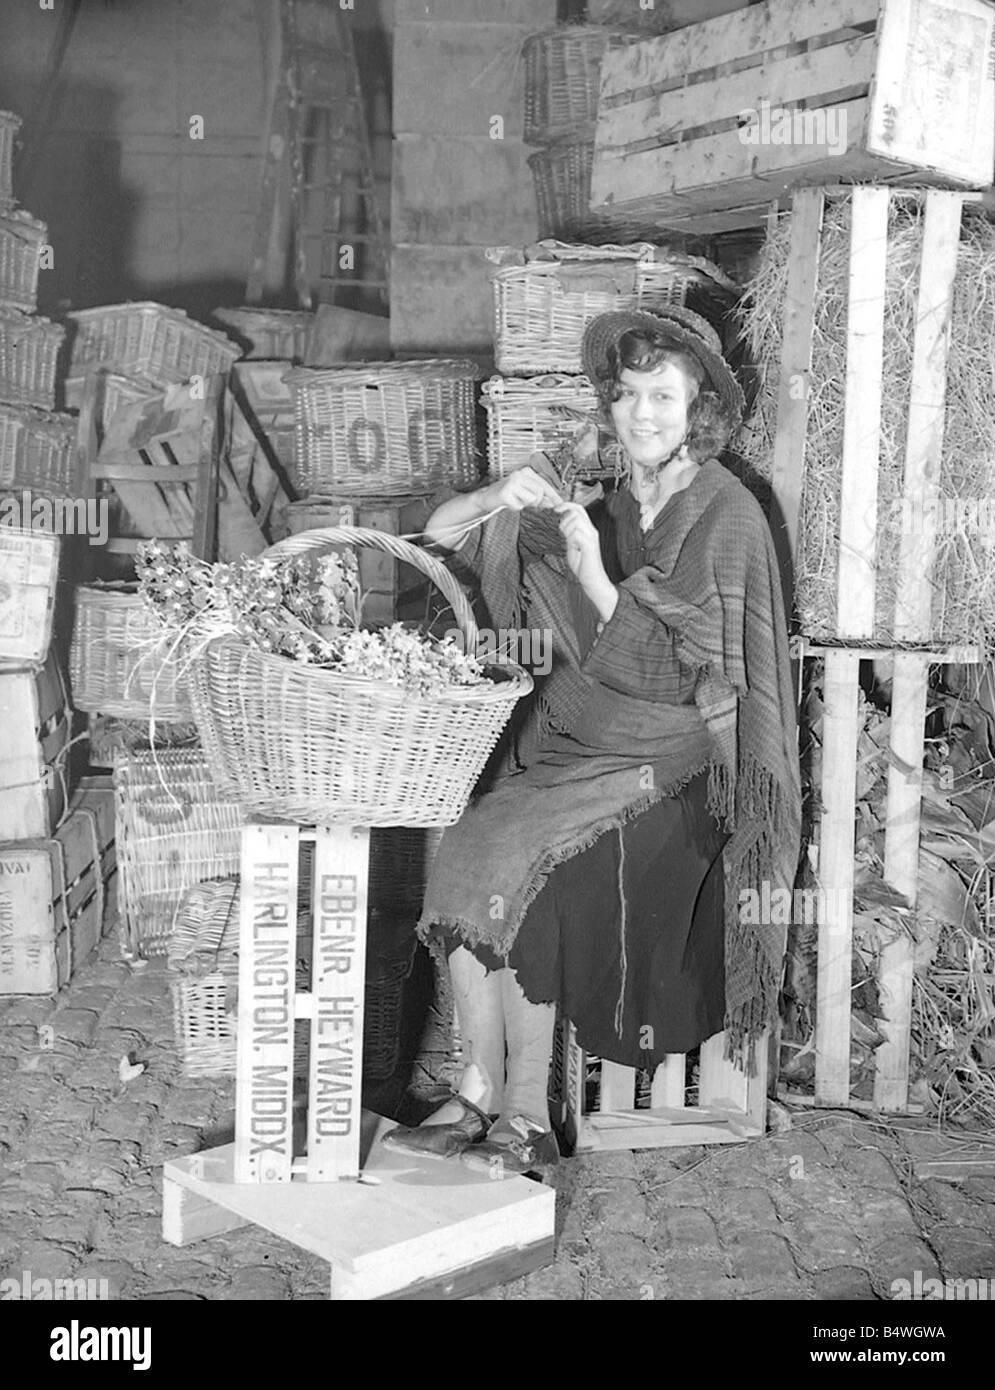 Actress Wendy Hiller as Eliza Doolittle on the set of Pygmalion Clothing Laddered stockings 1938 1930s Entertainment - Stock Image